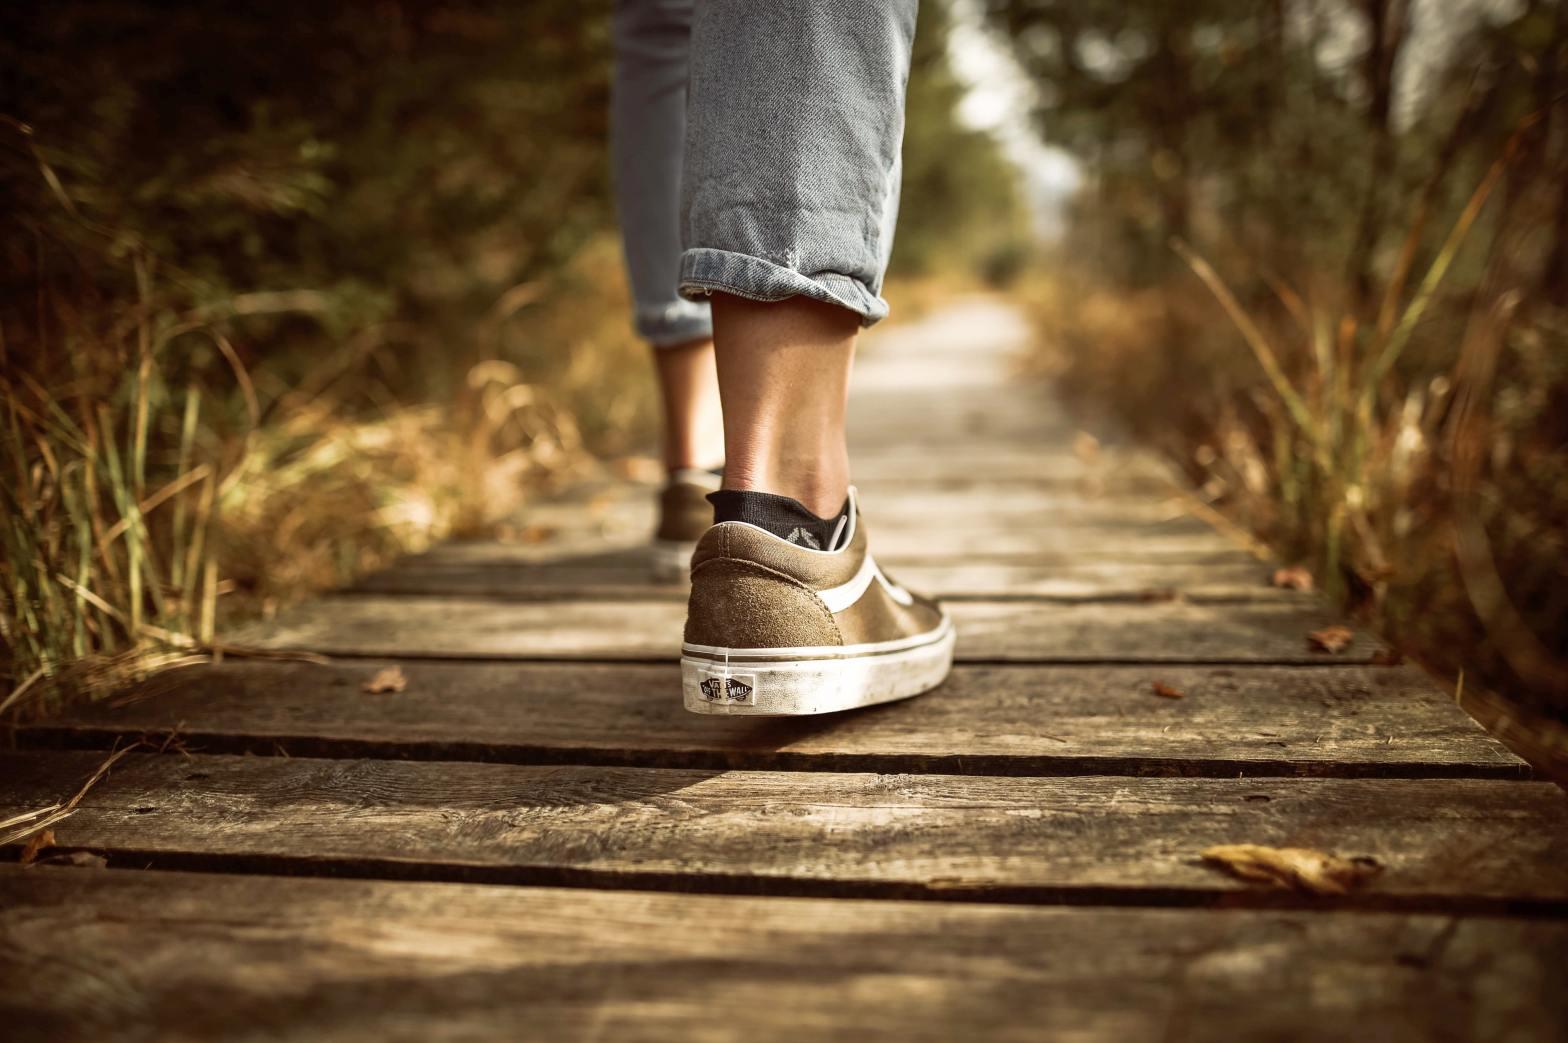 View of a woman's tennis shoes walking down a boardwalk